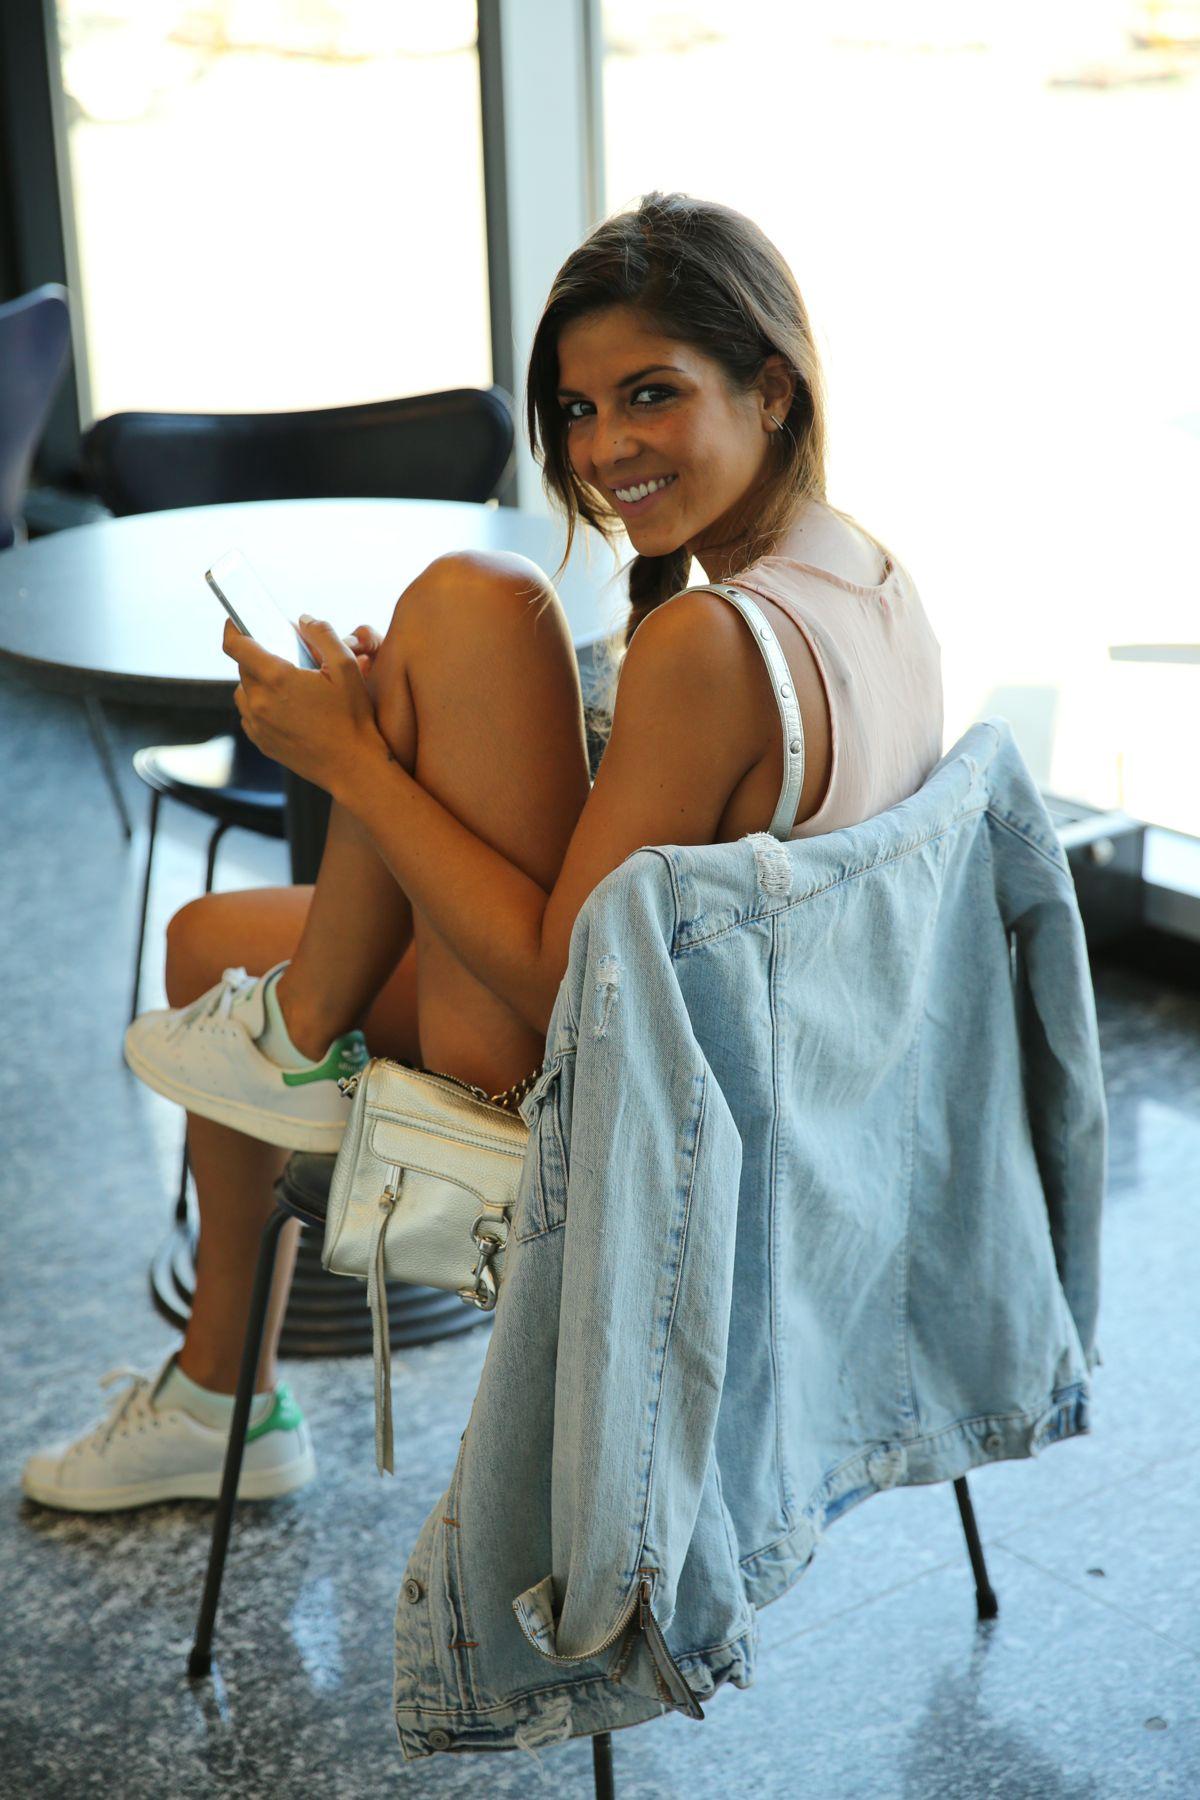 trendy_taste-look-outfit-street_style-ootd-blog-blogger-fashion_spain-moda_españa-traveling-viaje-frankfurt-stan_smith-adidas-lentejuelas-top-denim-shorts-vaqueros_rotos-20